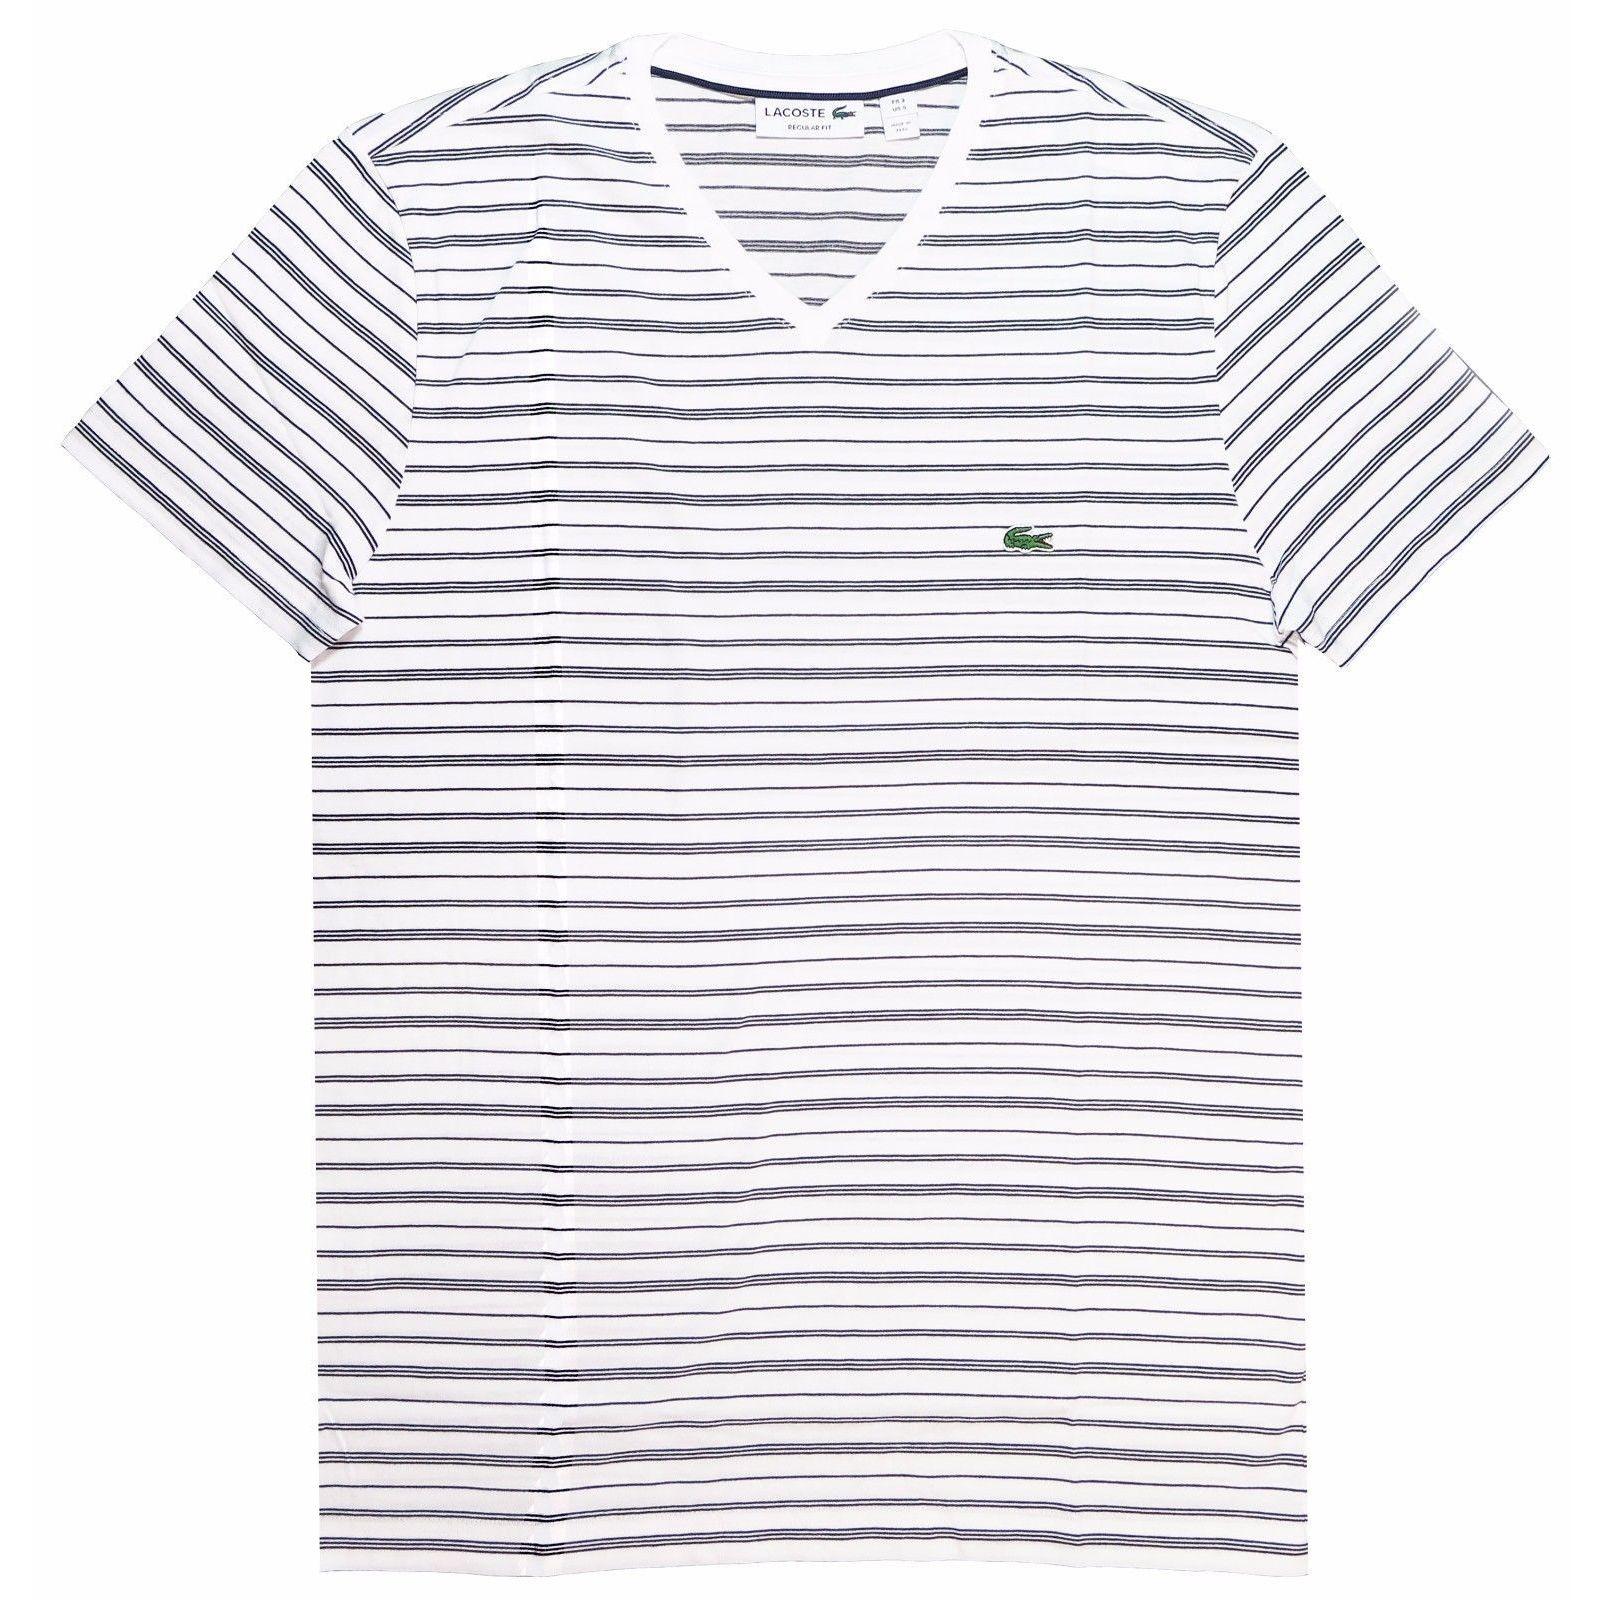 Lacoste Men's White Striped T-shirt (L)